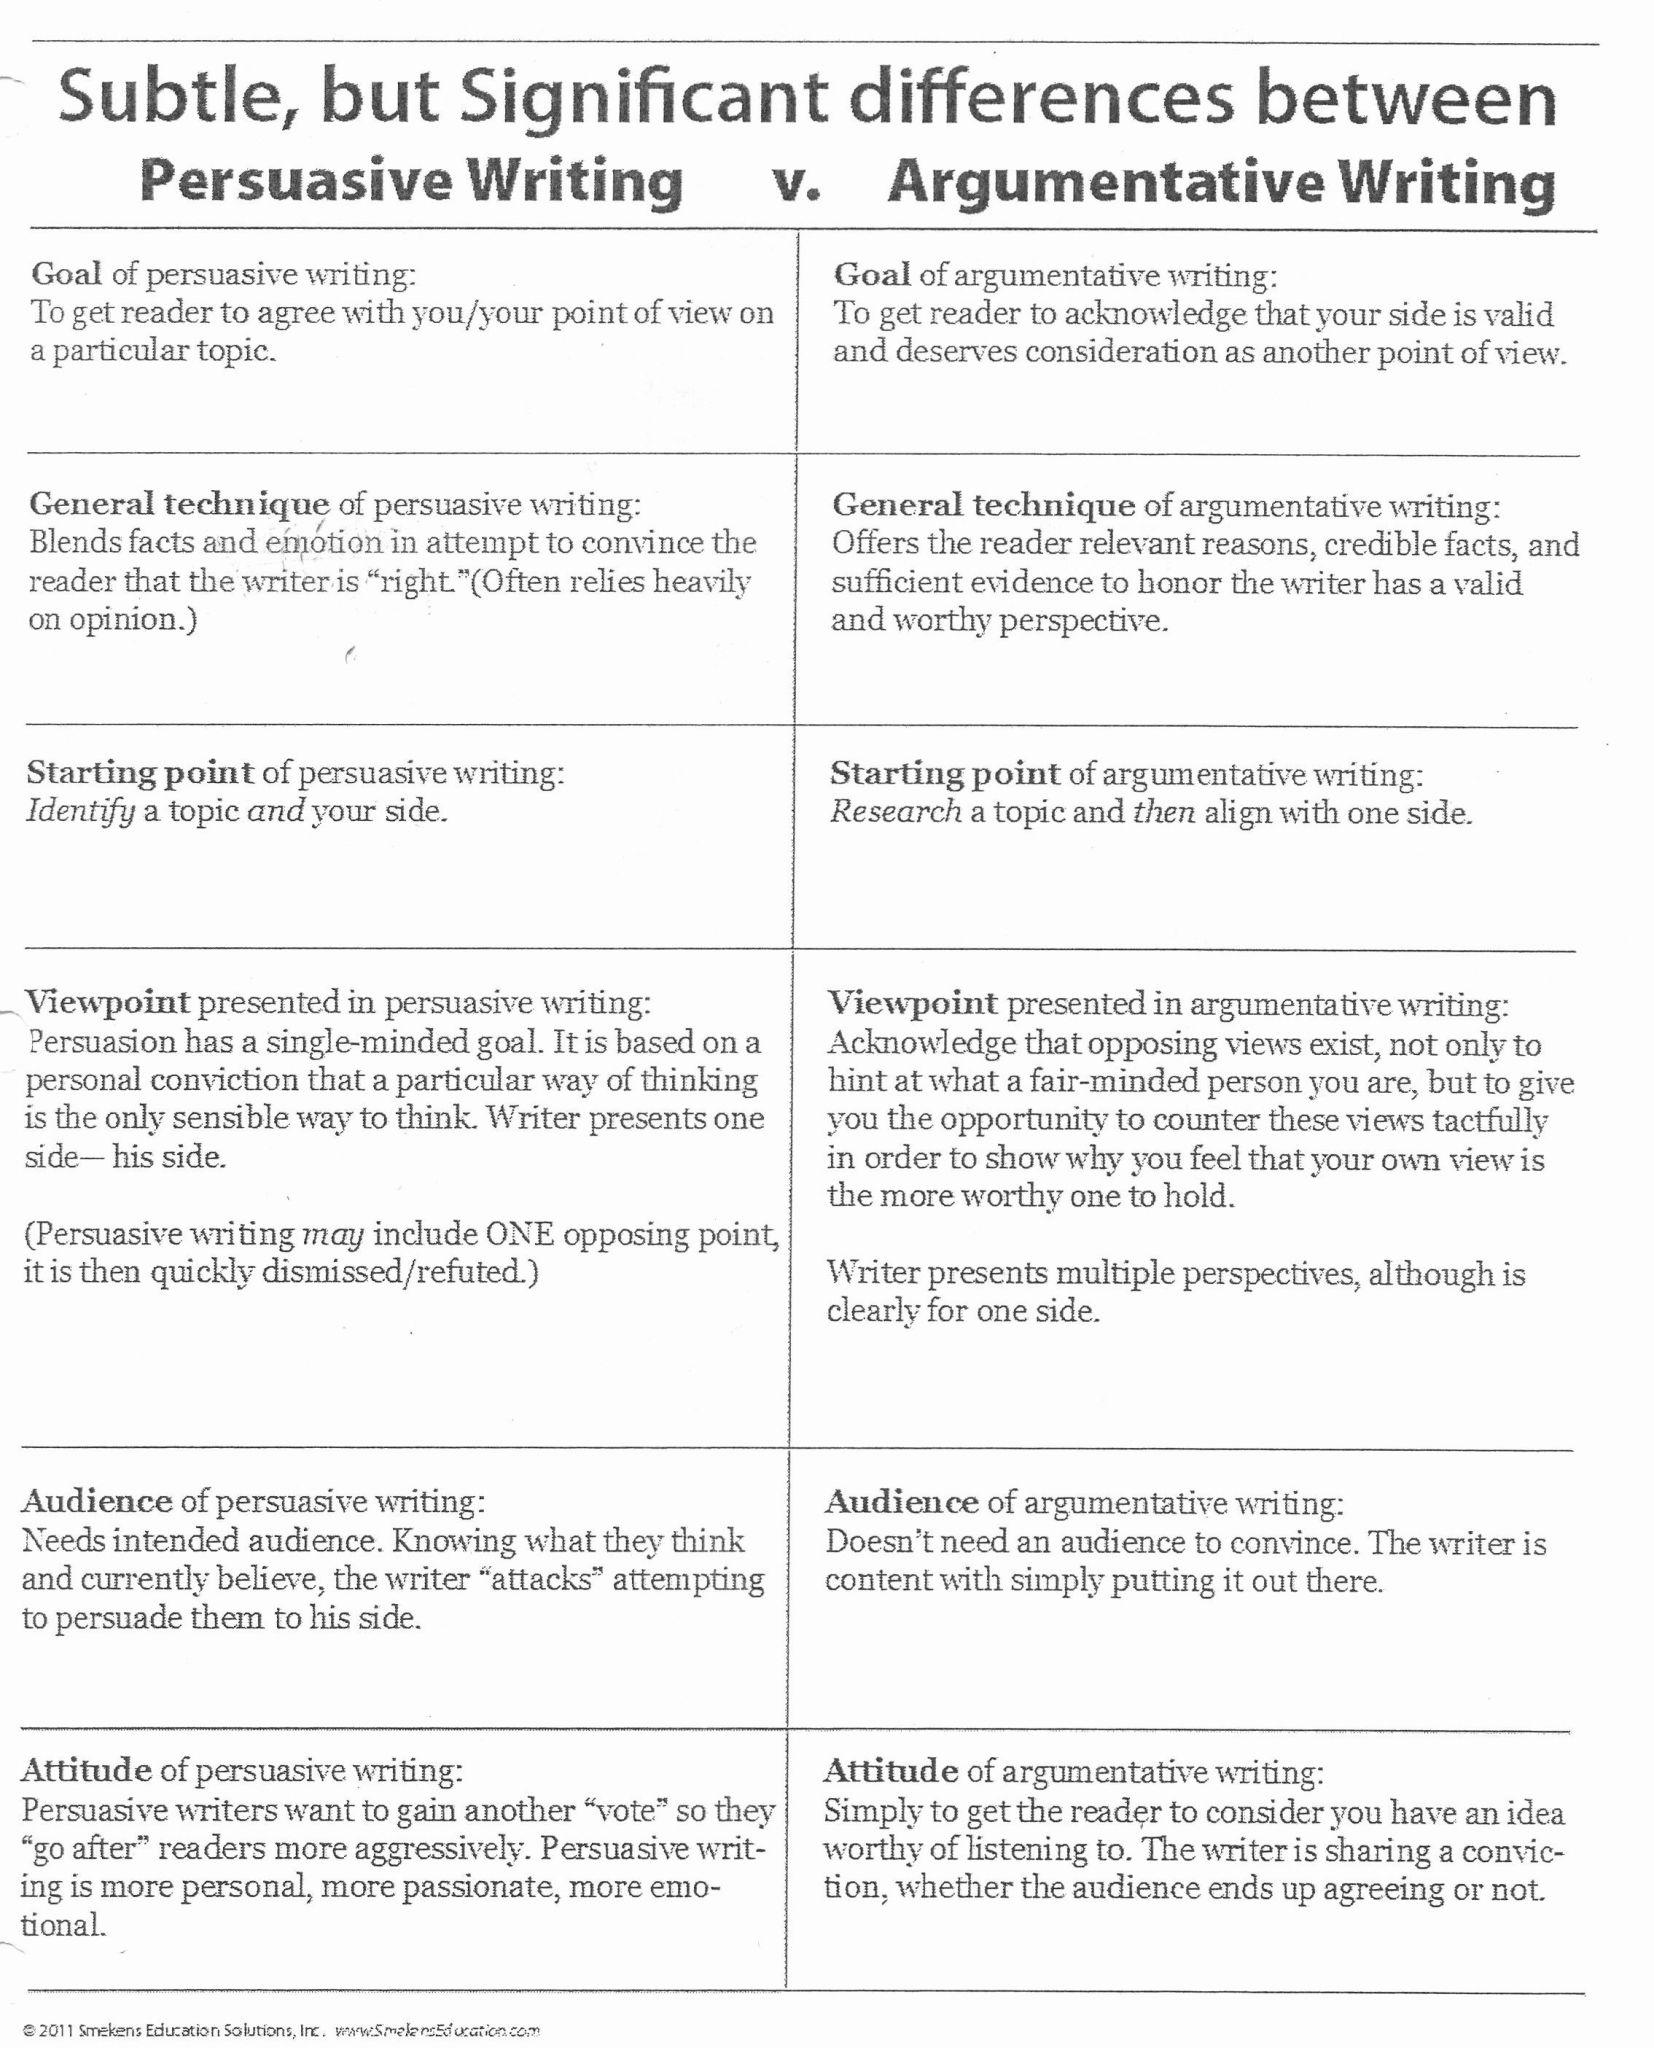 Life Skills Worksheets For Highschool Students